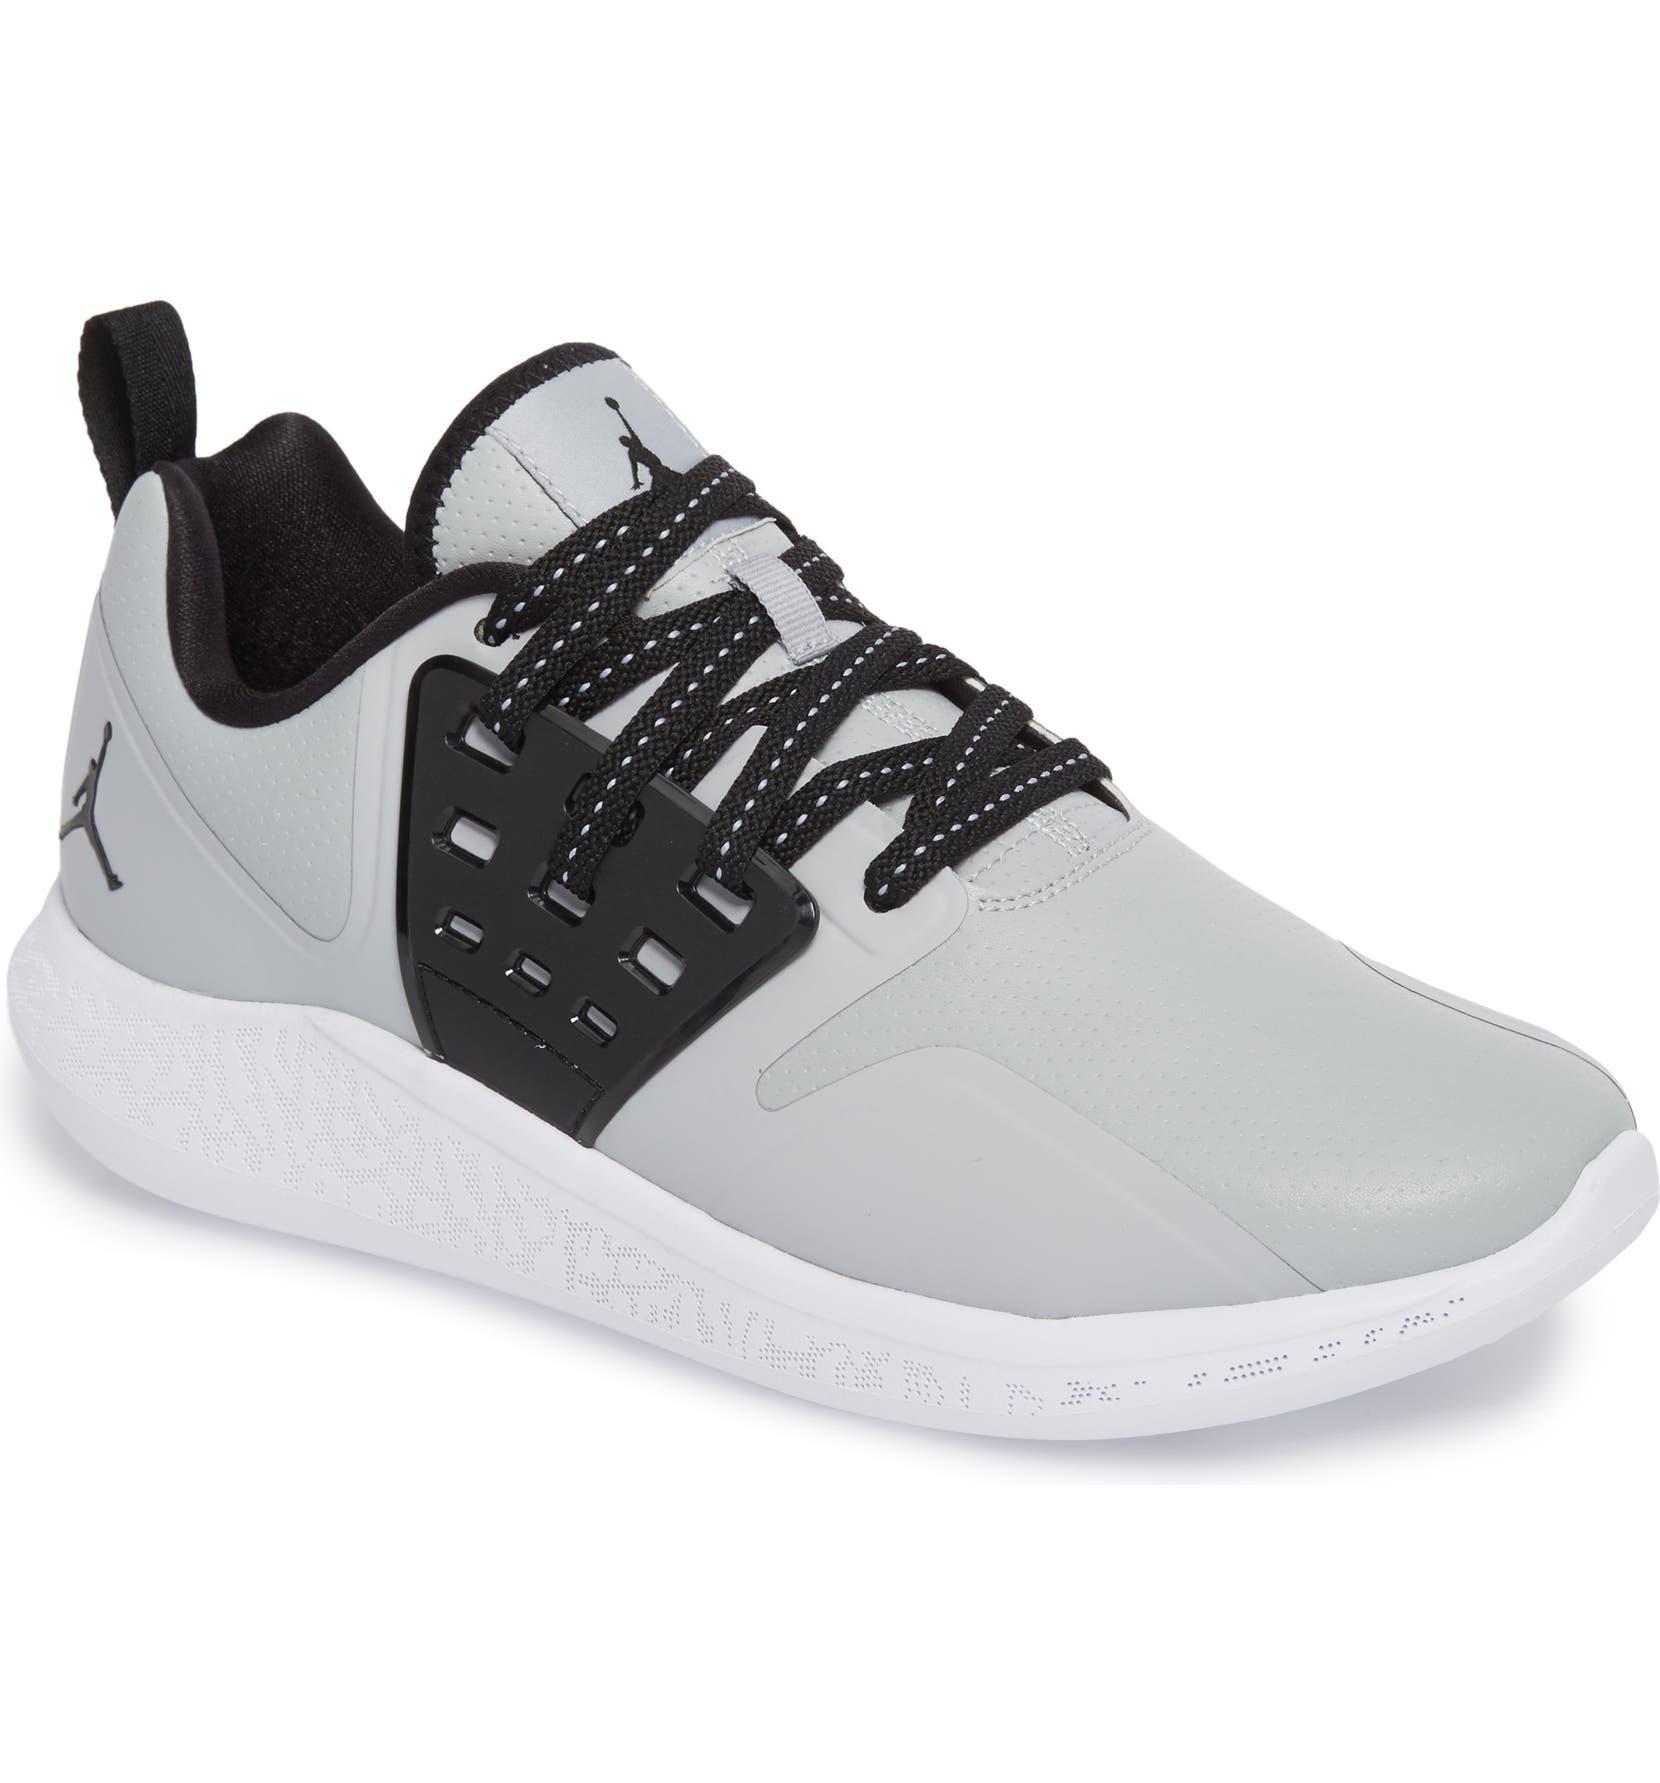 Details about Jordan Grind Mens Running Shoes 115 White Black 136cc1509